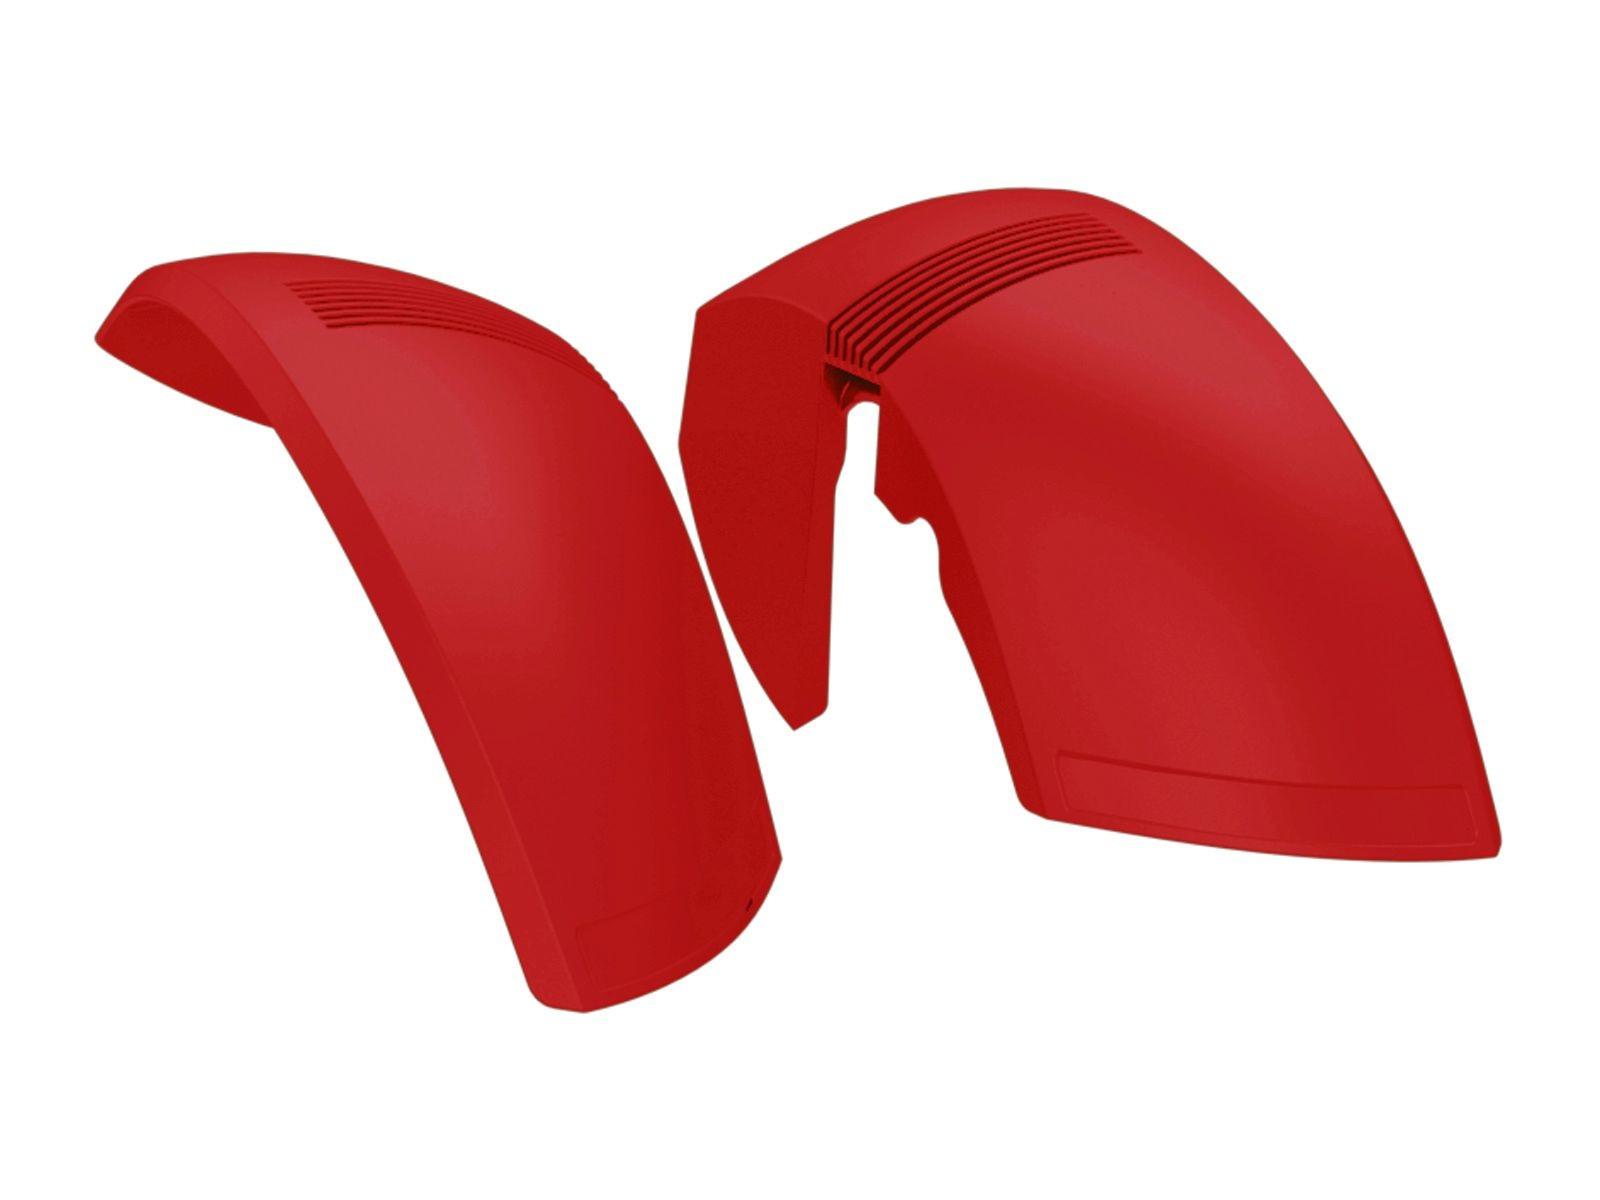 XL Frame - Rear mudguards 71° Case IH